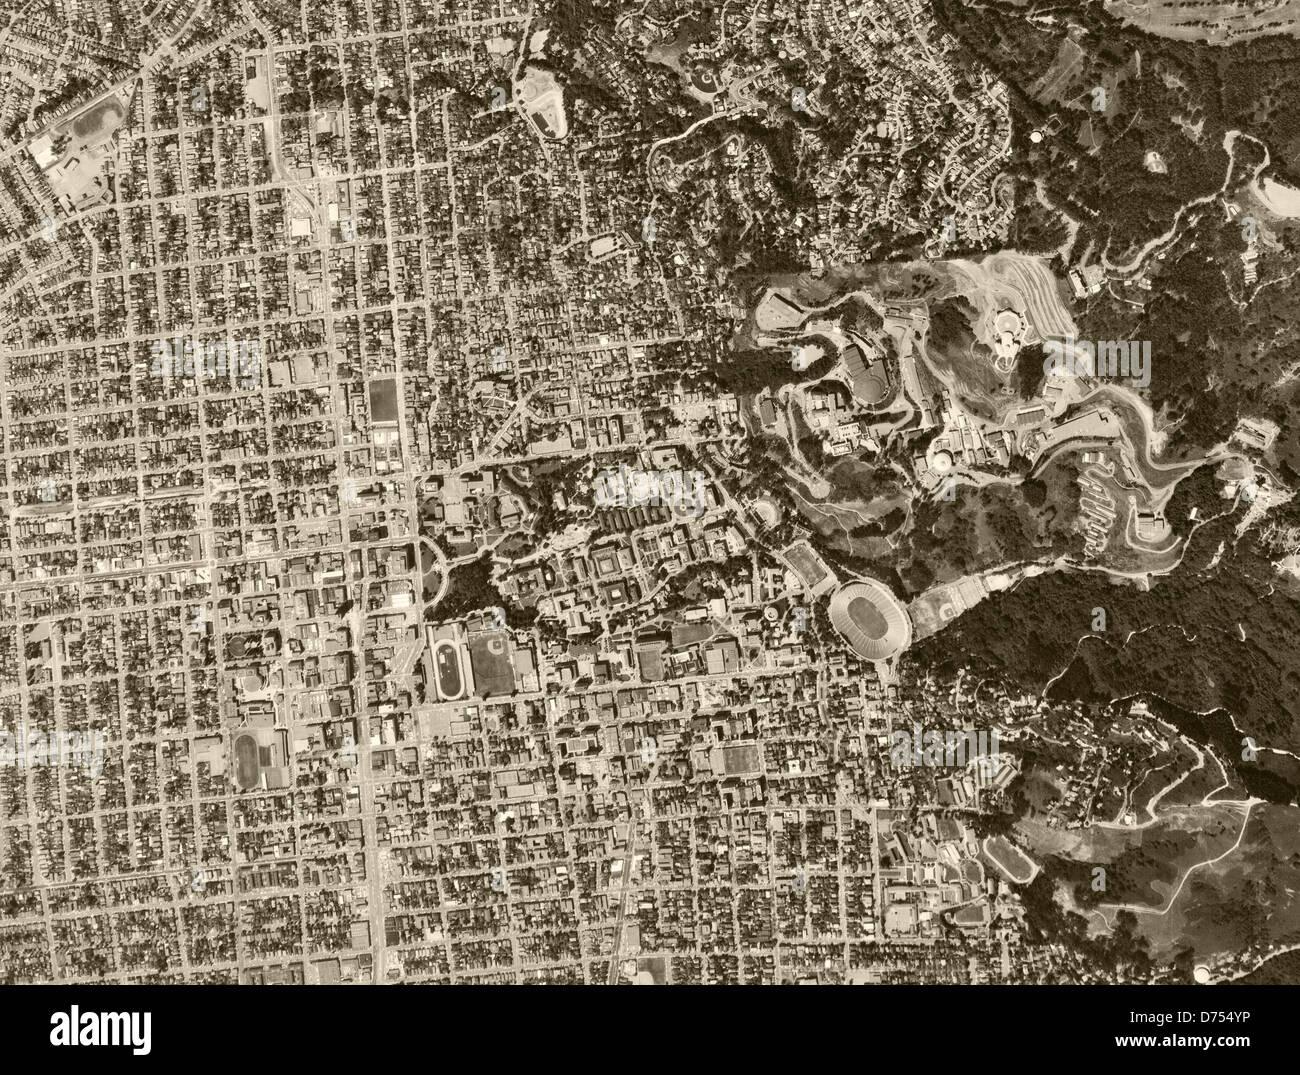 historical aerial photograph Berkeley, California, 1968 - Stock Image